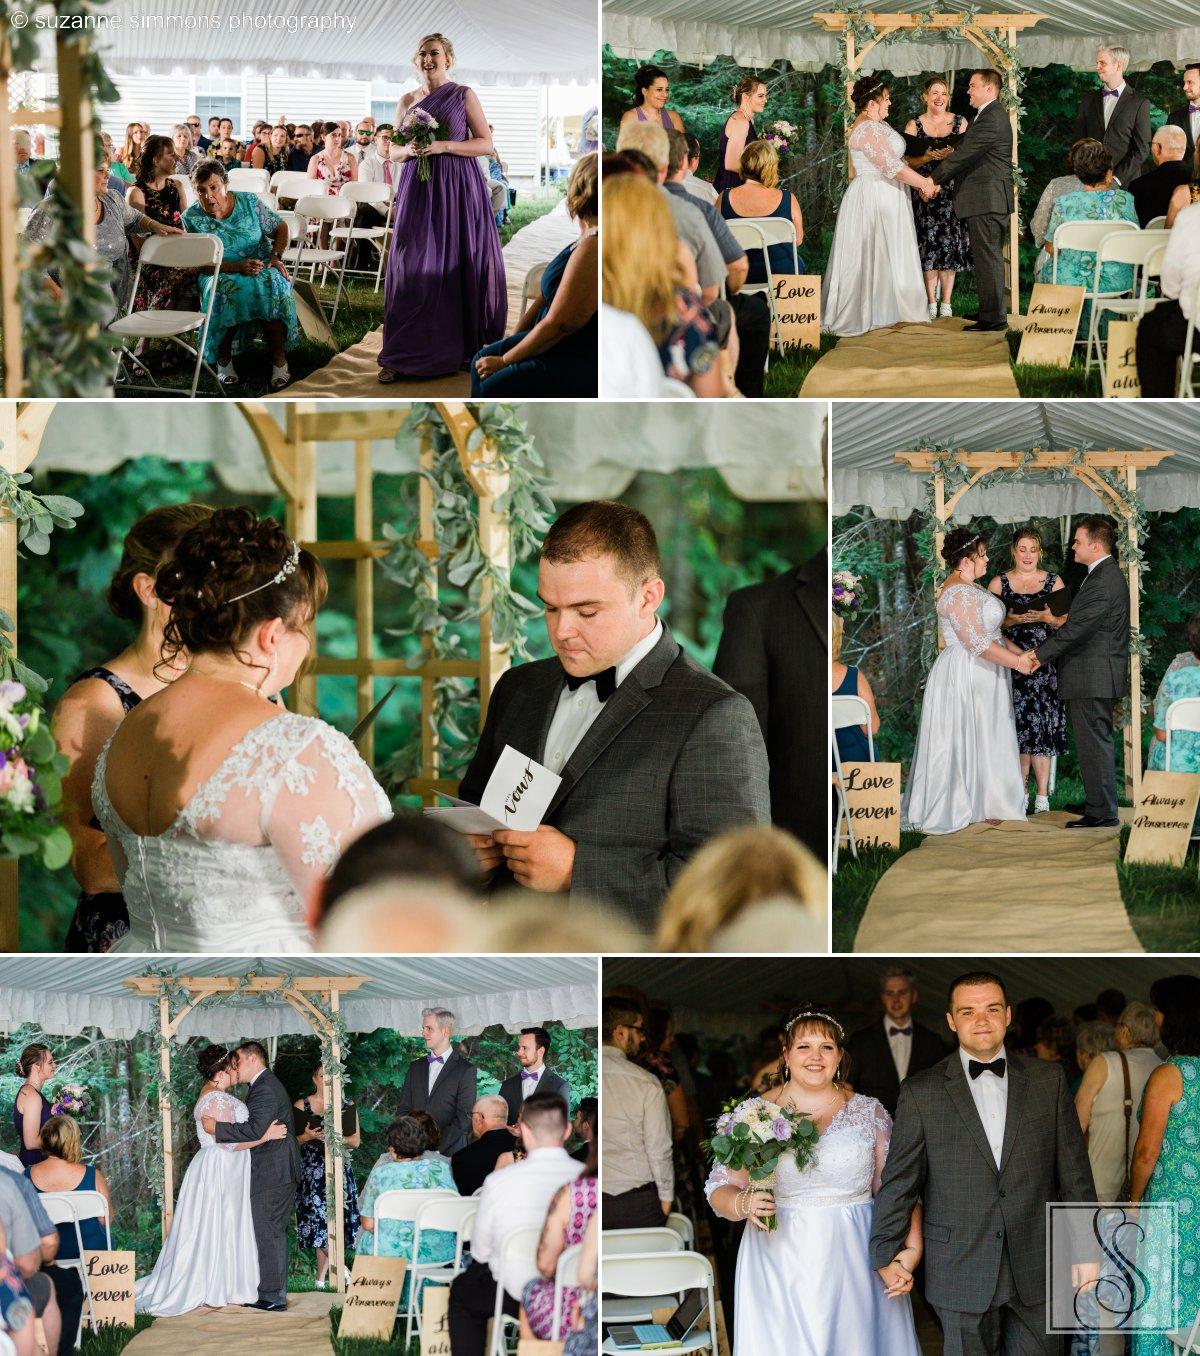 Backyard wedding ceremony in Standish, Maine